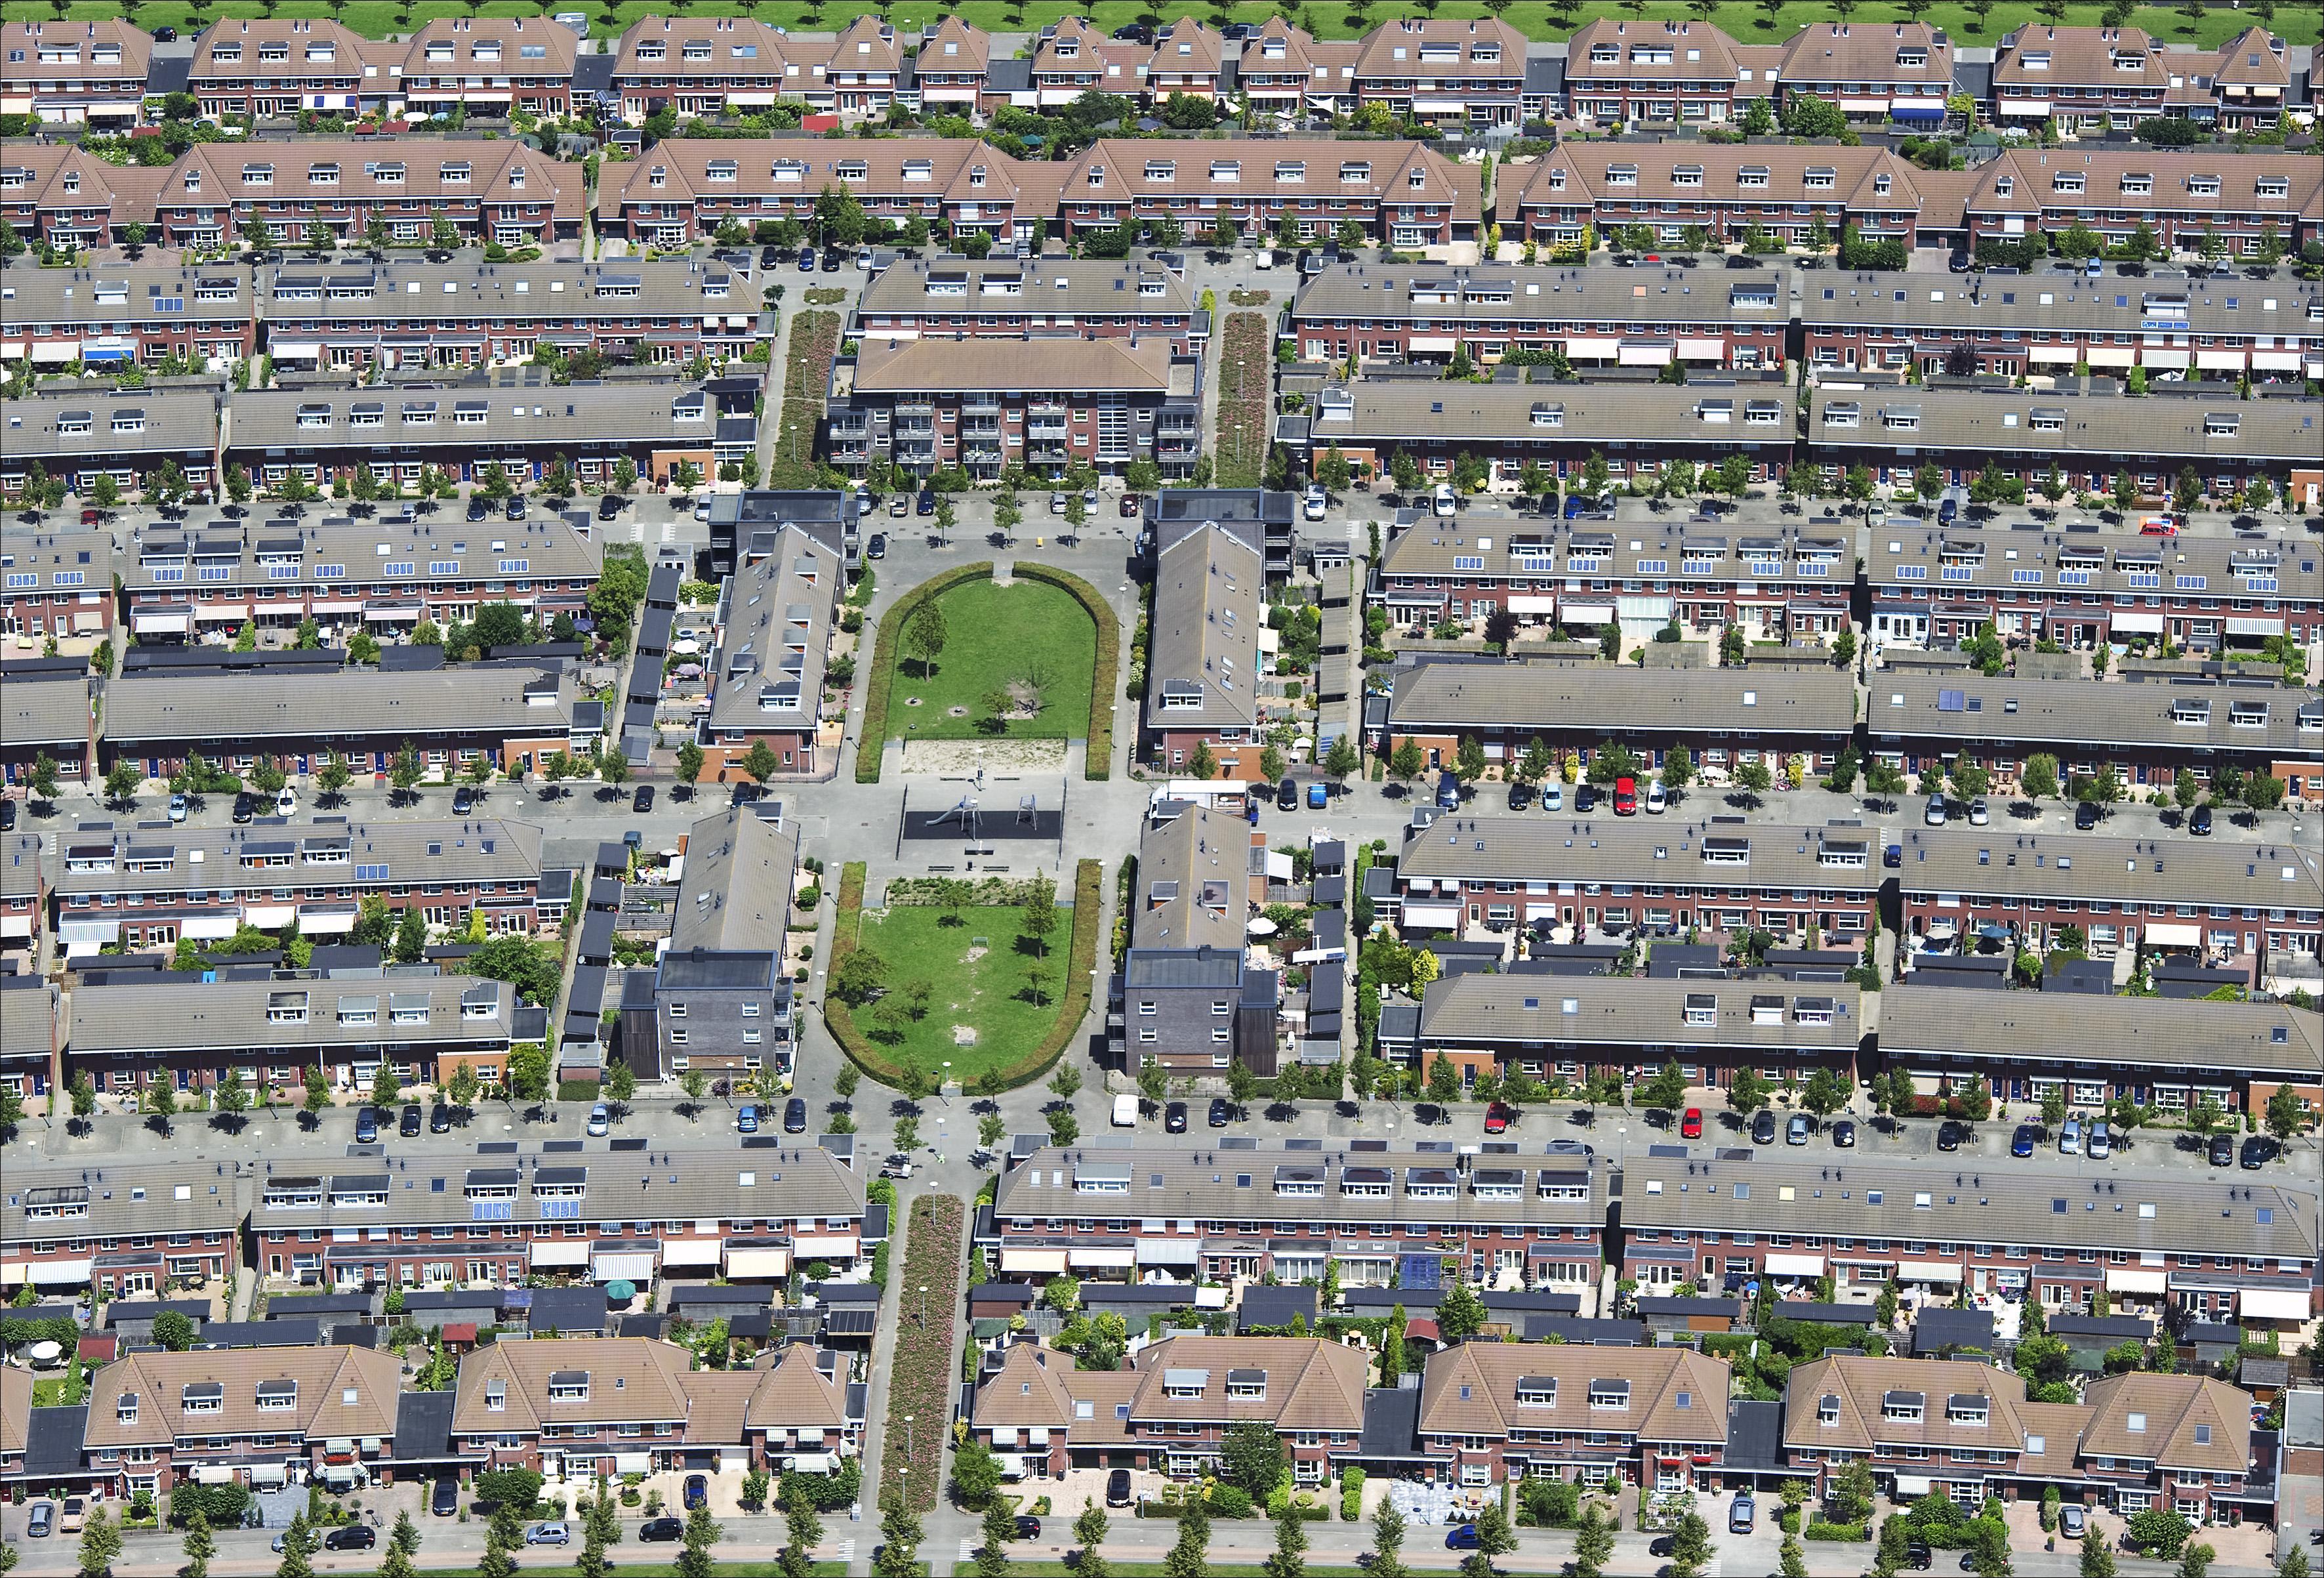 Haarlemmermeer heeft grote moeite huisvesten van nog eens 240 statushouders: 'Hebben grote woningnood en onvoldoende geld'